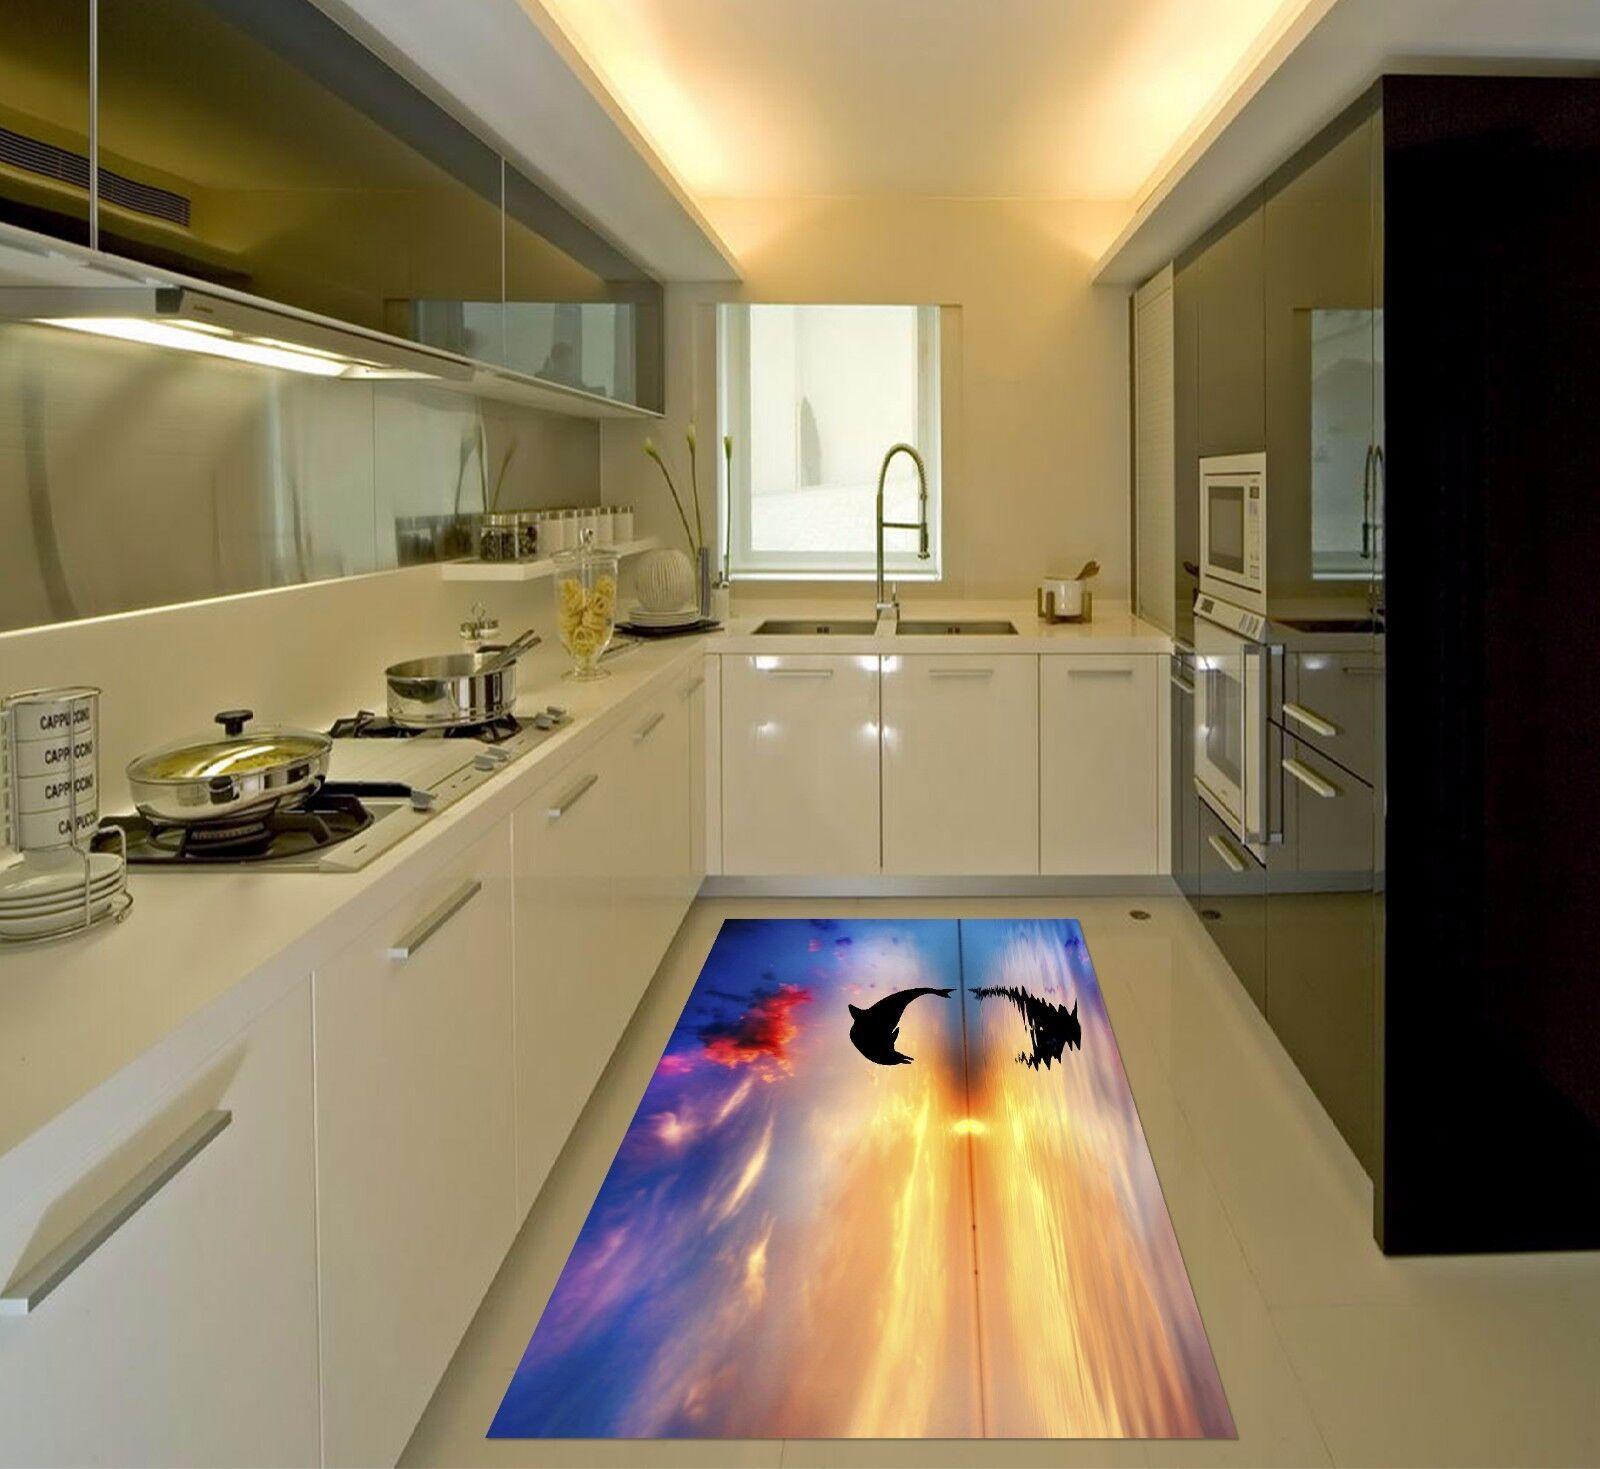 3D Sky Water 417 Kitchen Mat Floor Murals Wall Print Wall AJ WALLPAPER AU Kyra